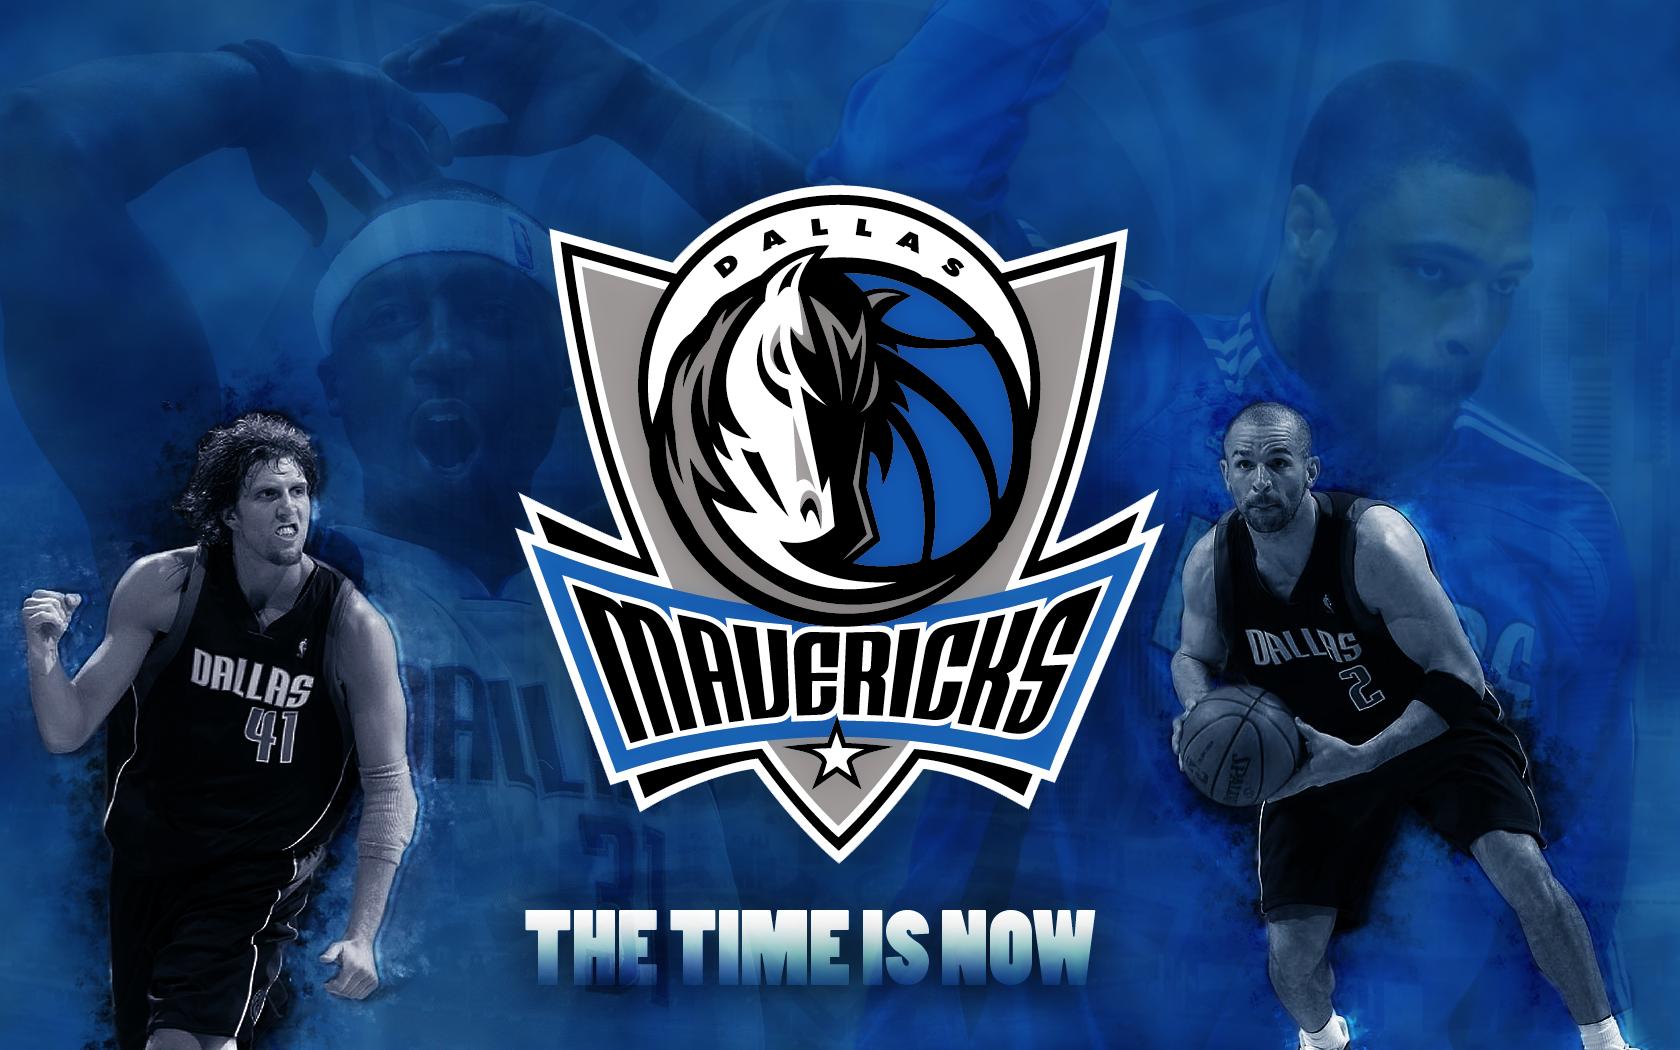 dallas mavericks Dallas mavericks team page, sortable stats, depth charts, season stats, career stats, news, commentary.